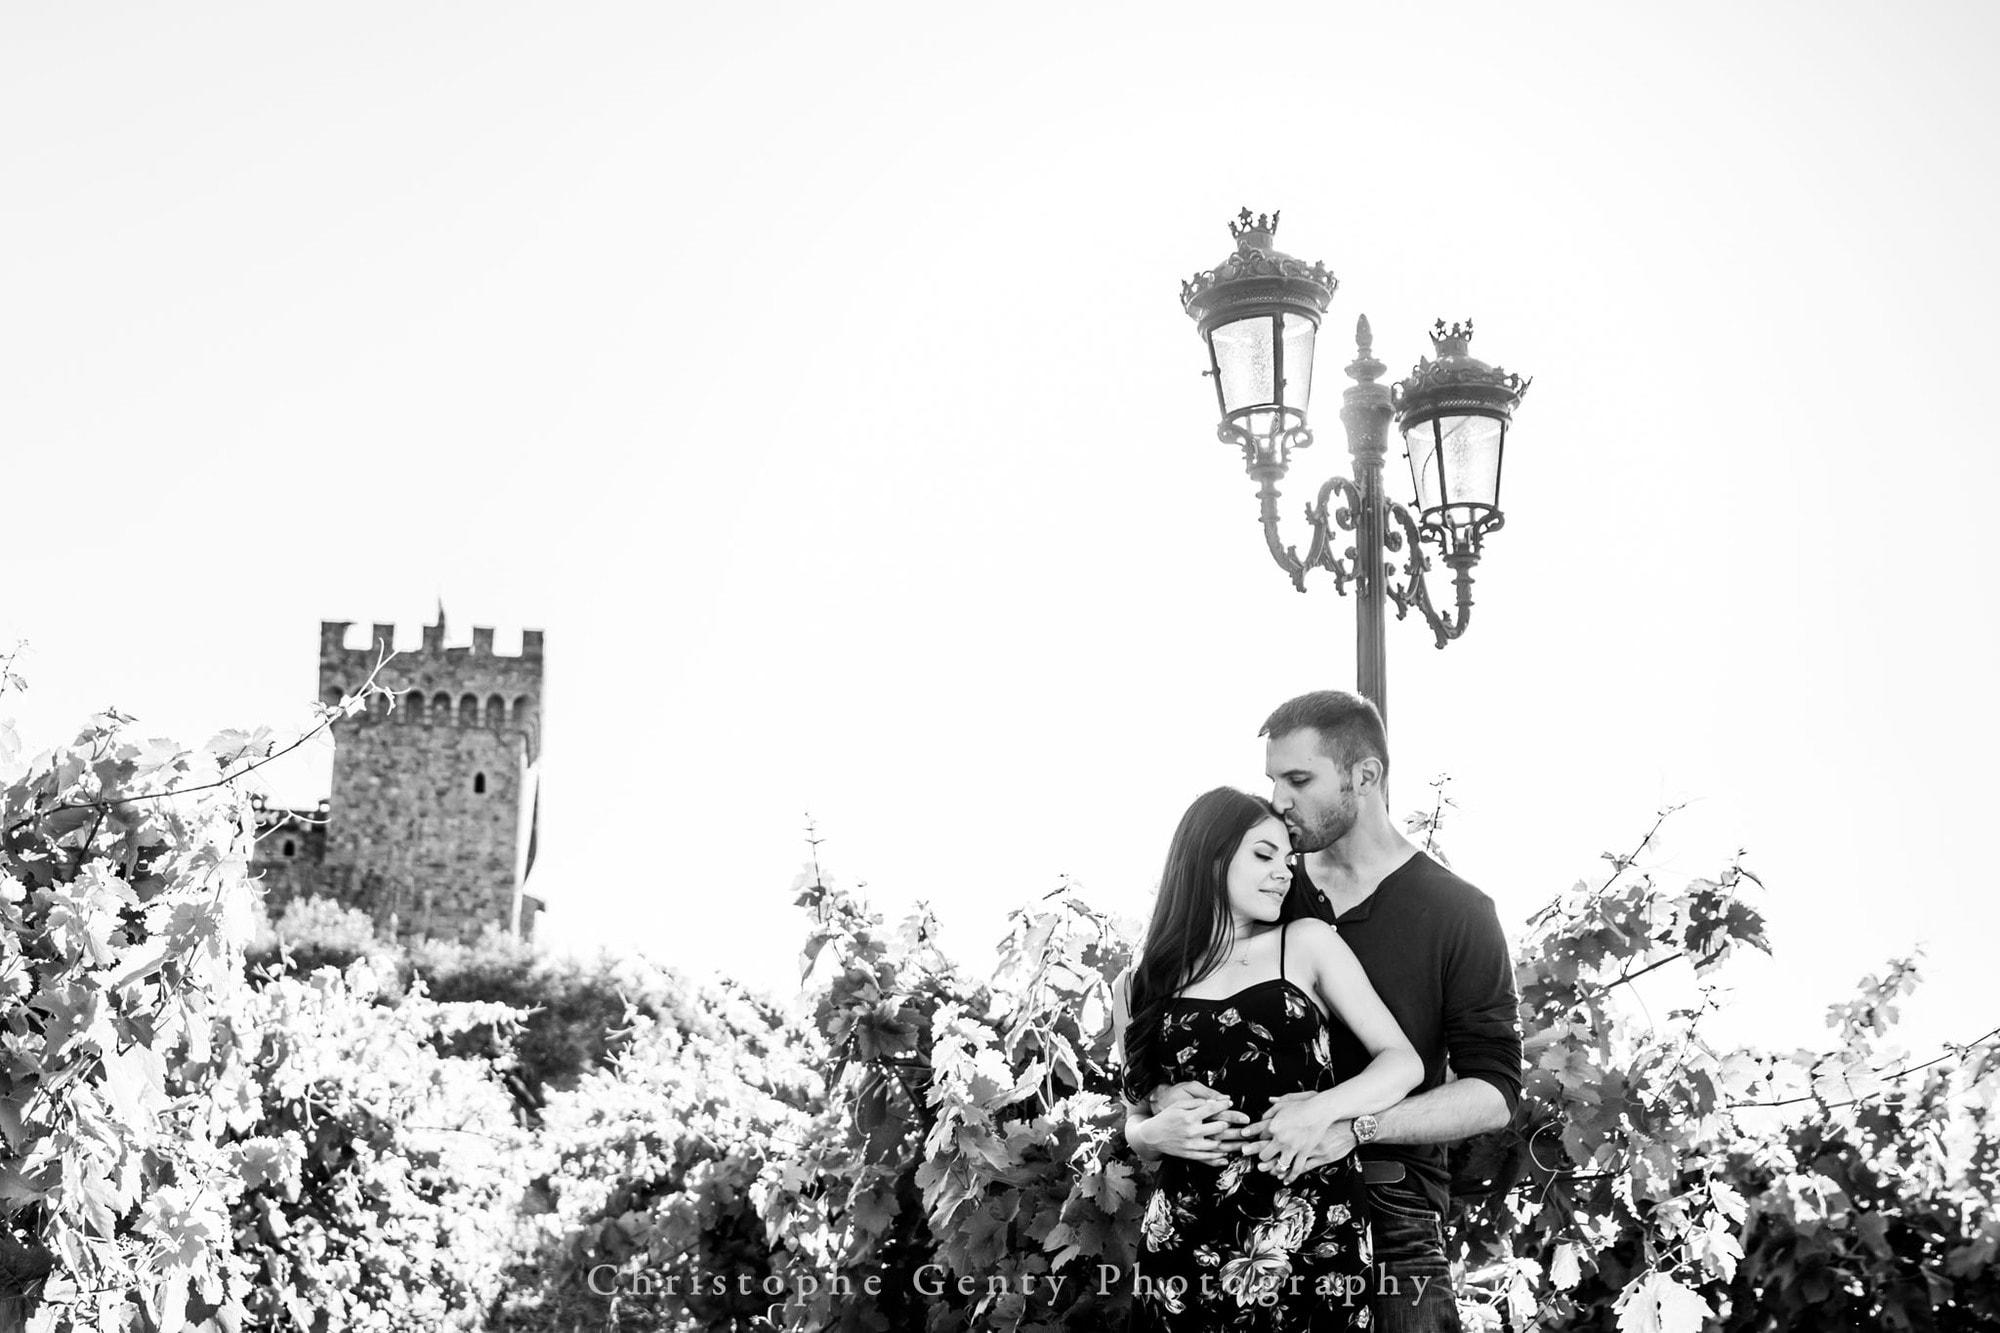 Castello di Amorosa Marriage Proposal Photography 370